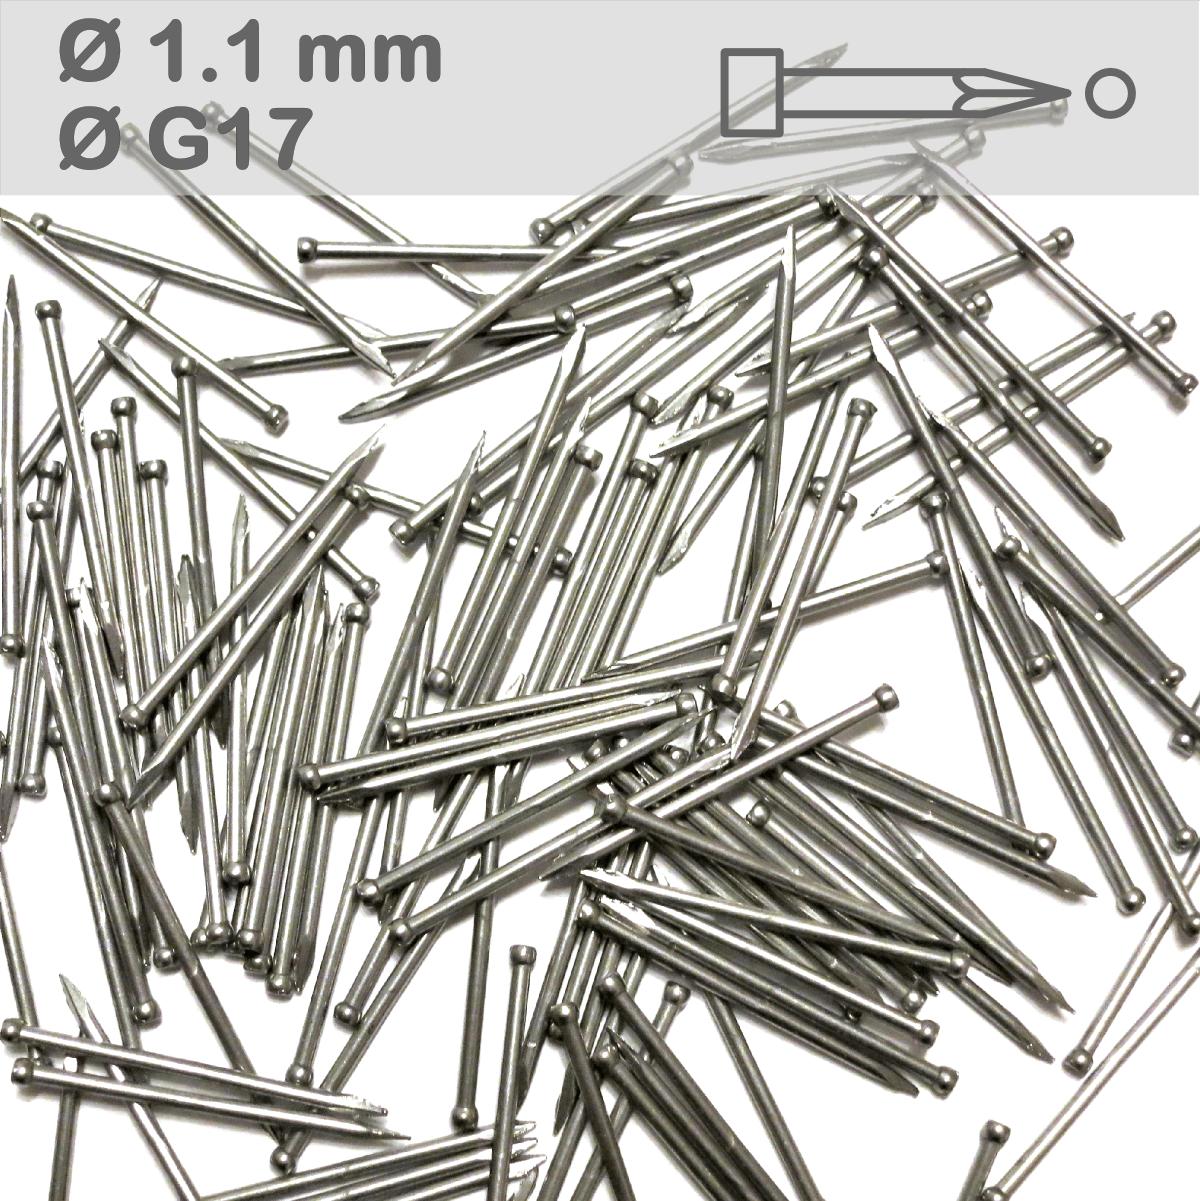 Schuhnägel, Schuster-Nägel, Drahtstifte, Sohlennägel, Stiefelnägel,